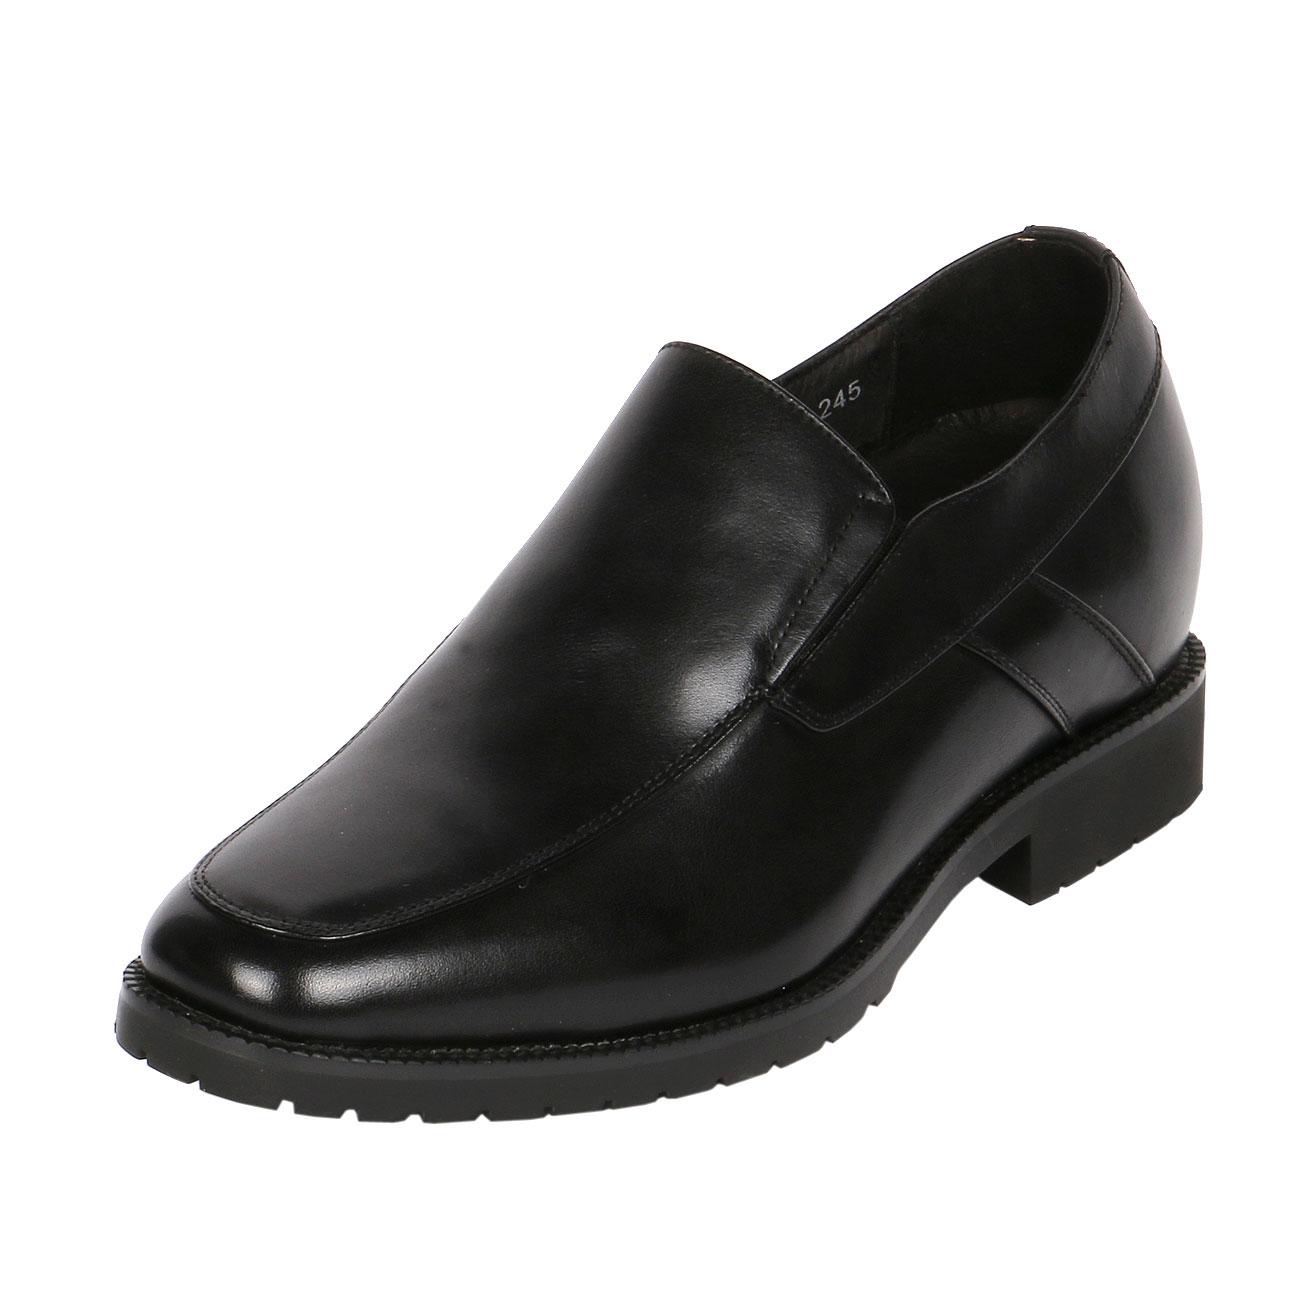 Men's Jota Apron Toe Lace Shoes Increasing Hight 3